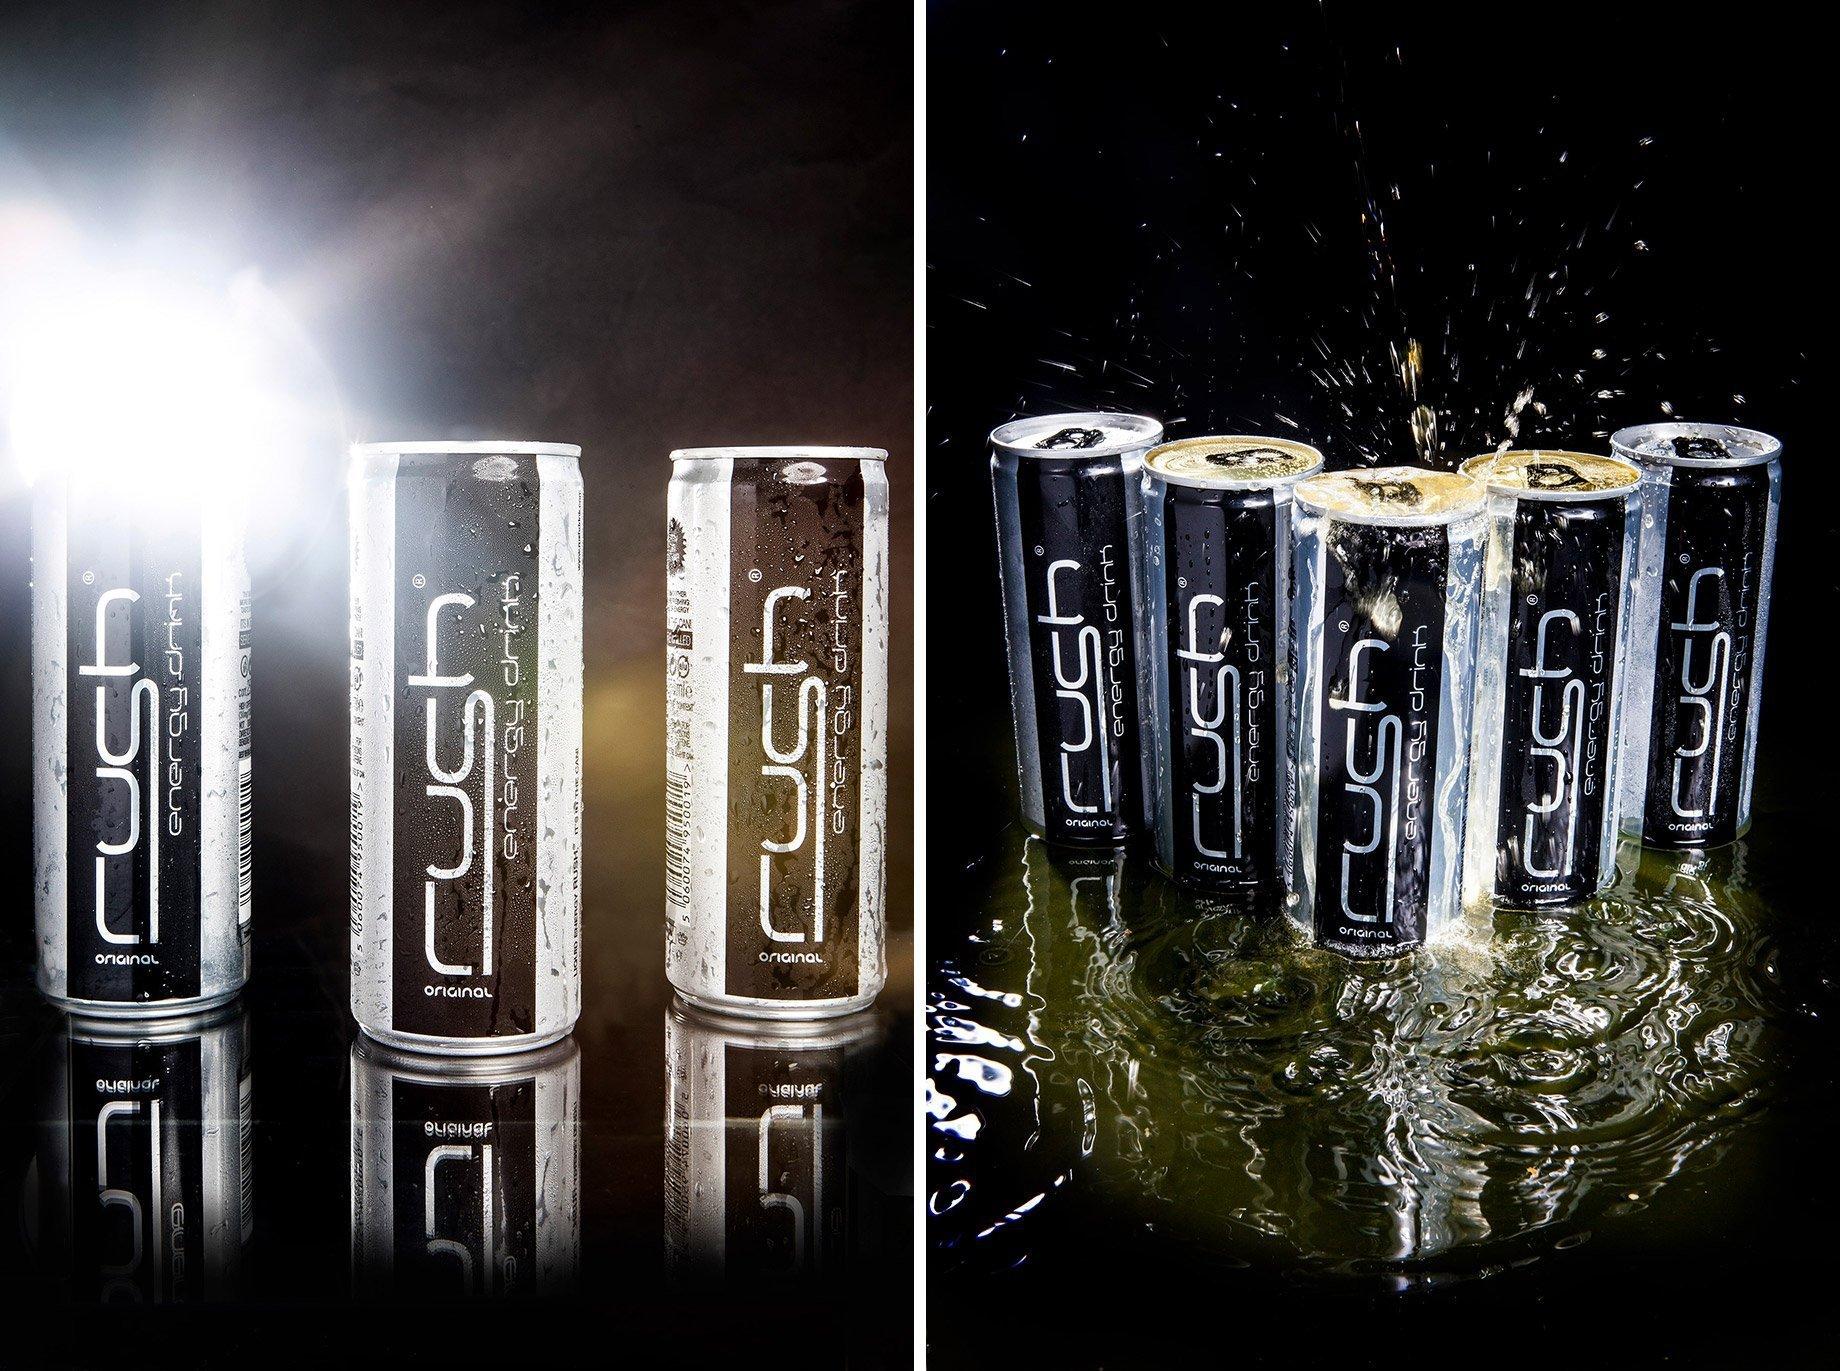 creative-product-photographer-lancashire-preston